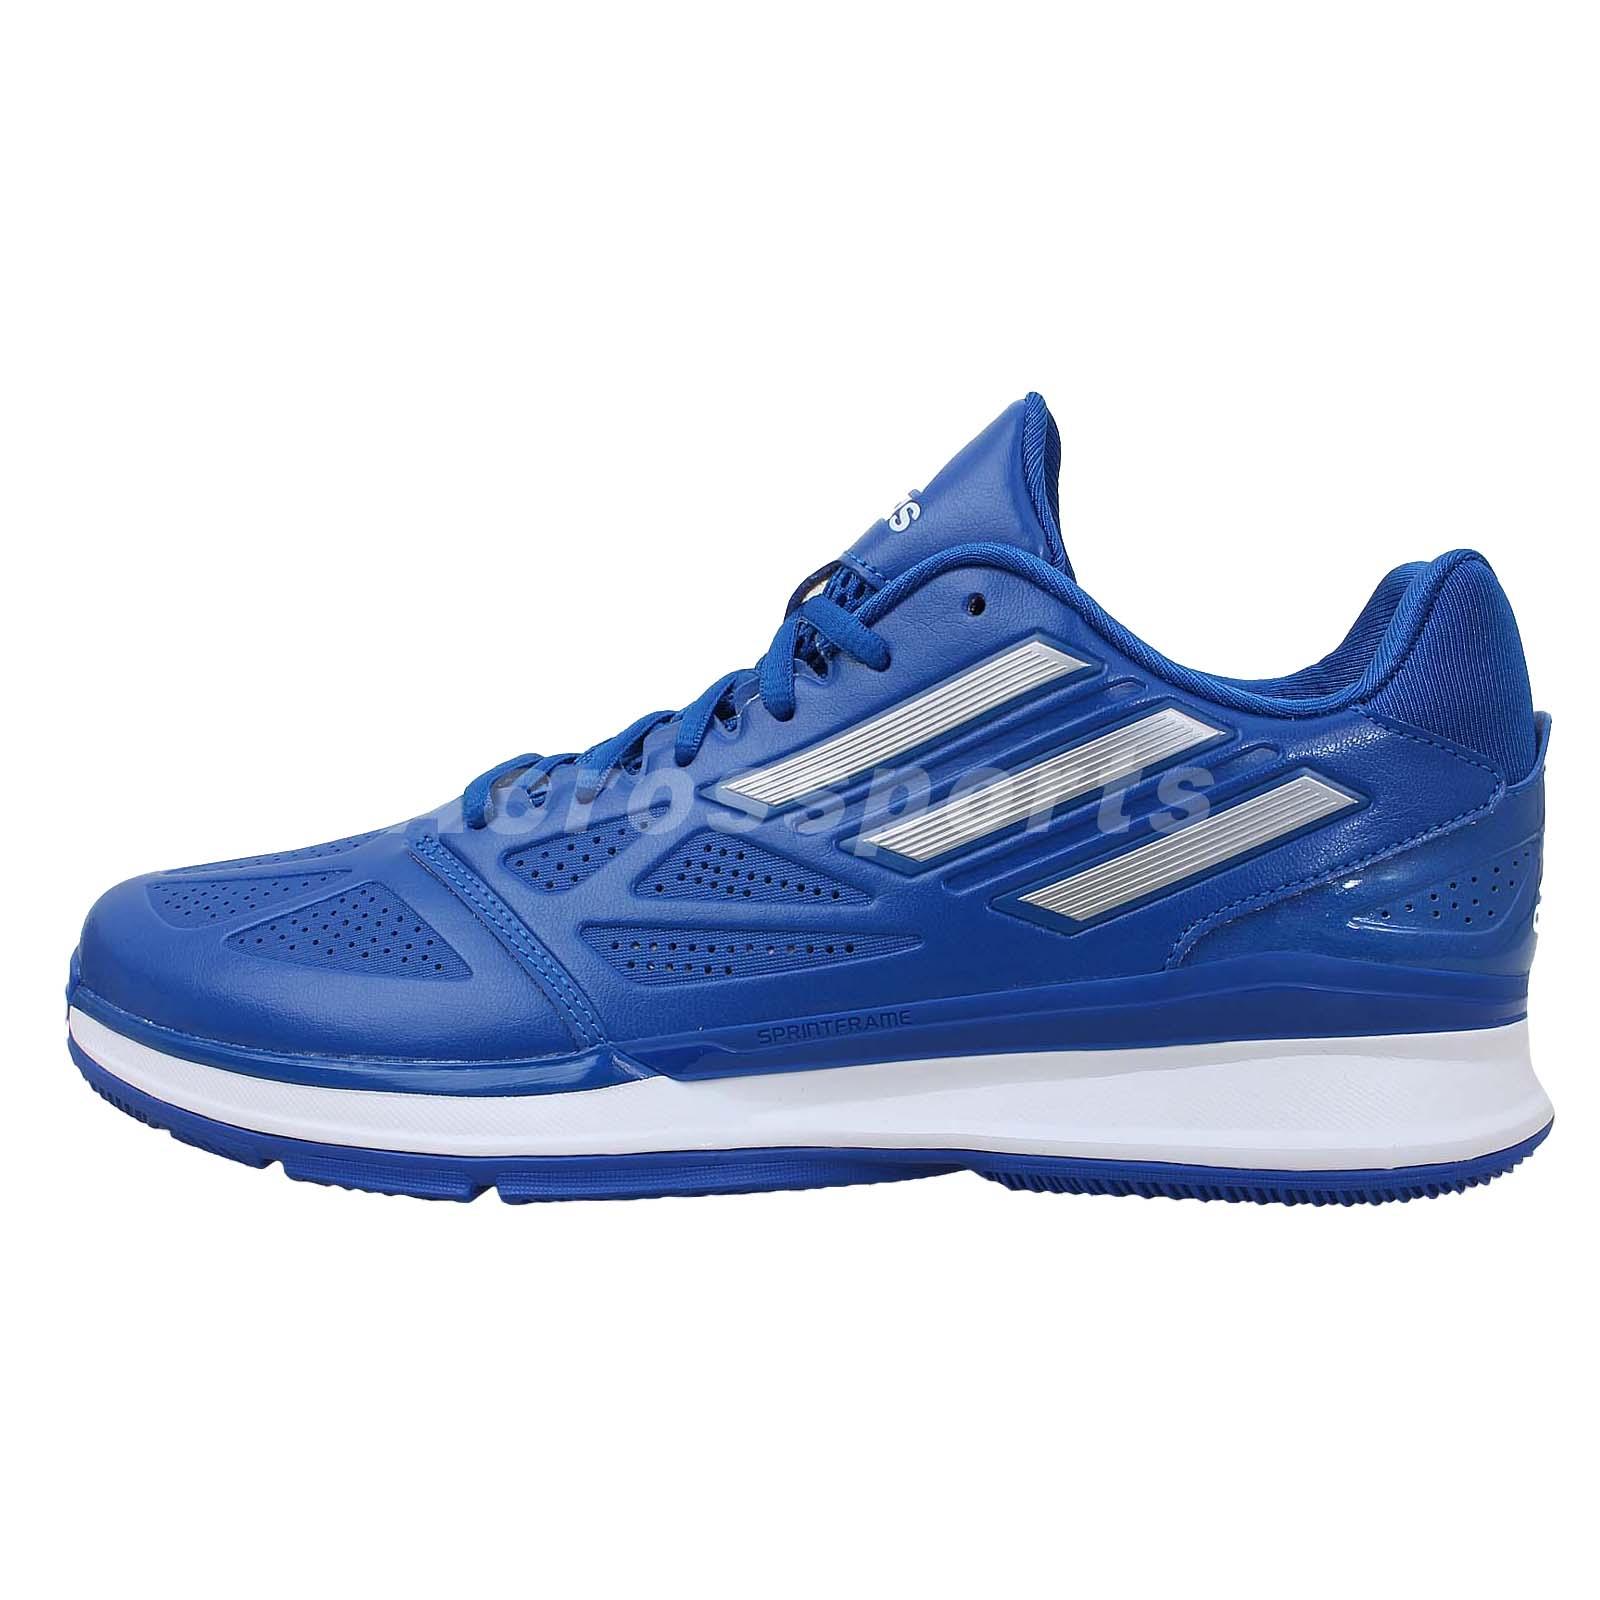 adidas basketball shoes low cut - 28 images - adidas ...